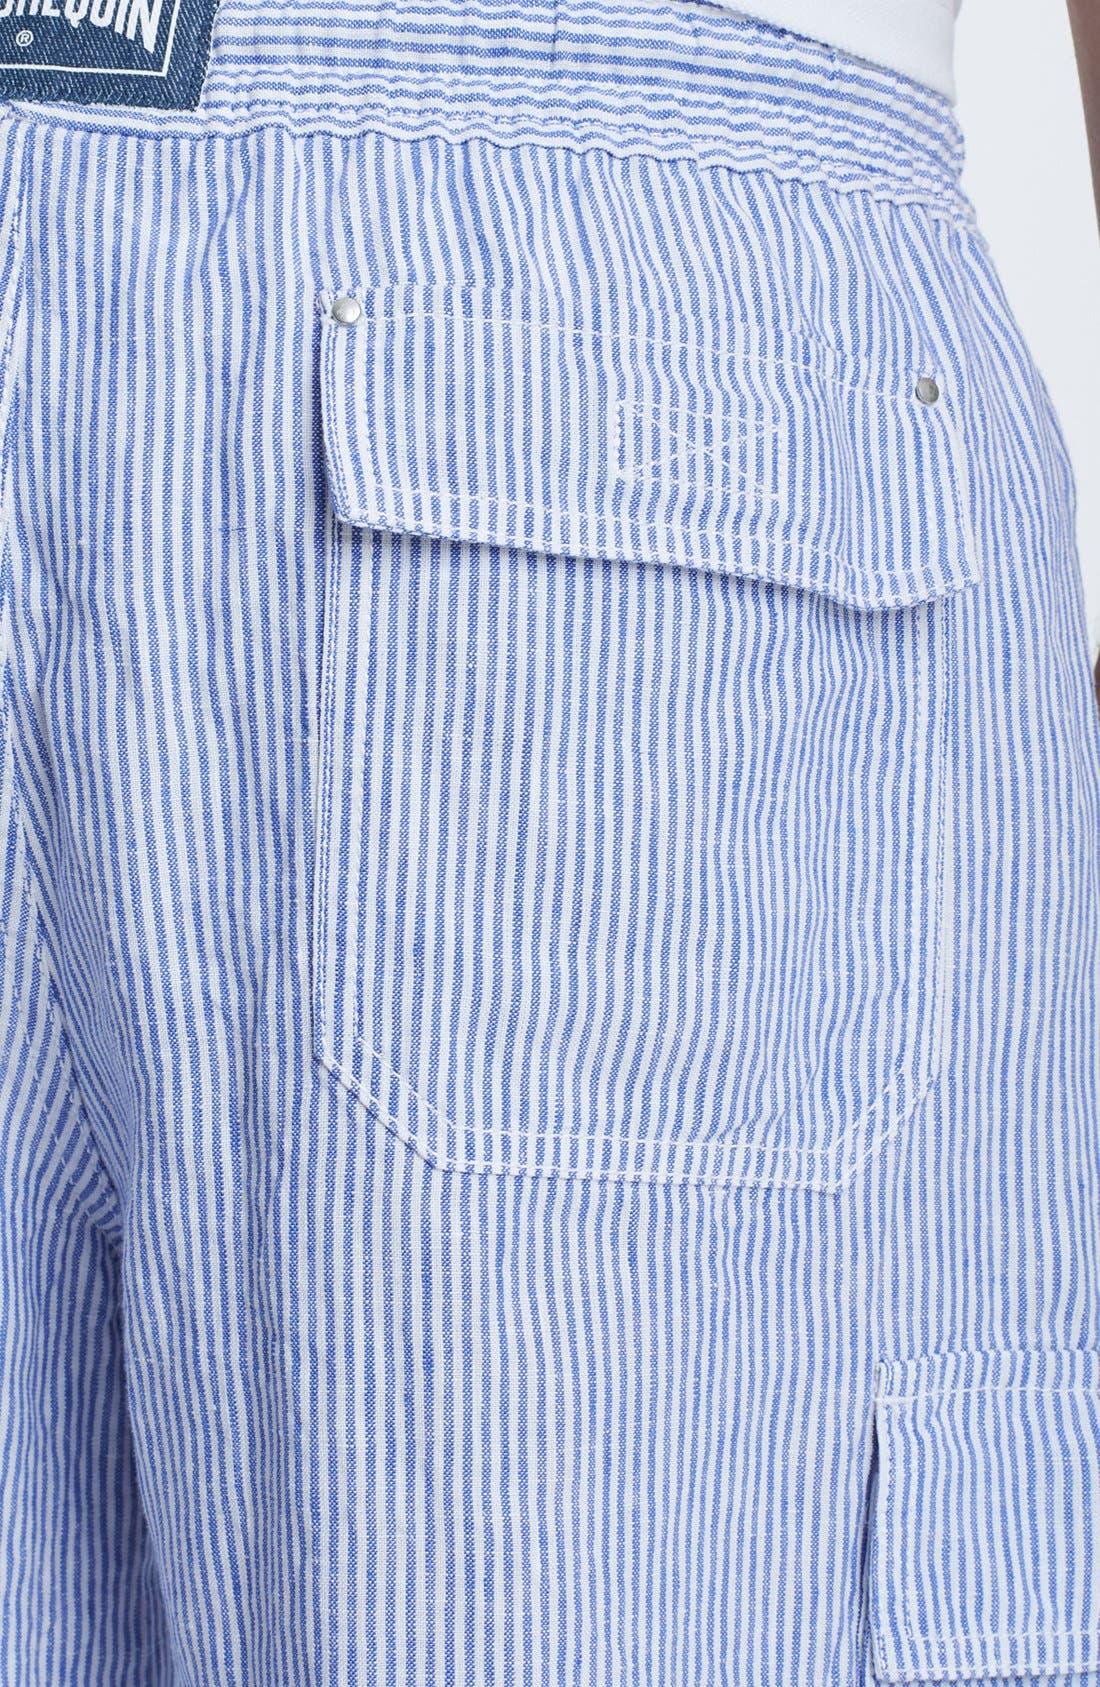 Alternate Image 3  - Vilebrequin 'Berrix' Stripe Linen Cargo Shorts